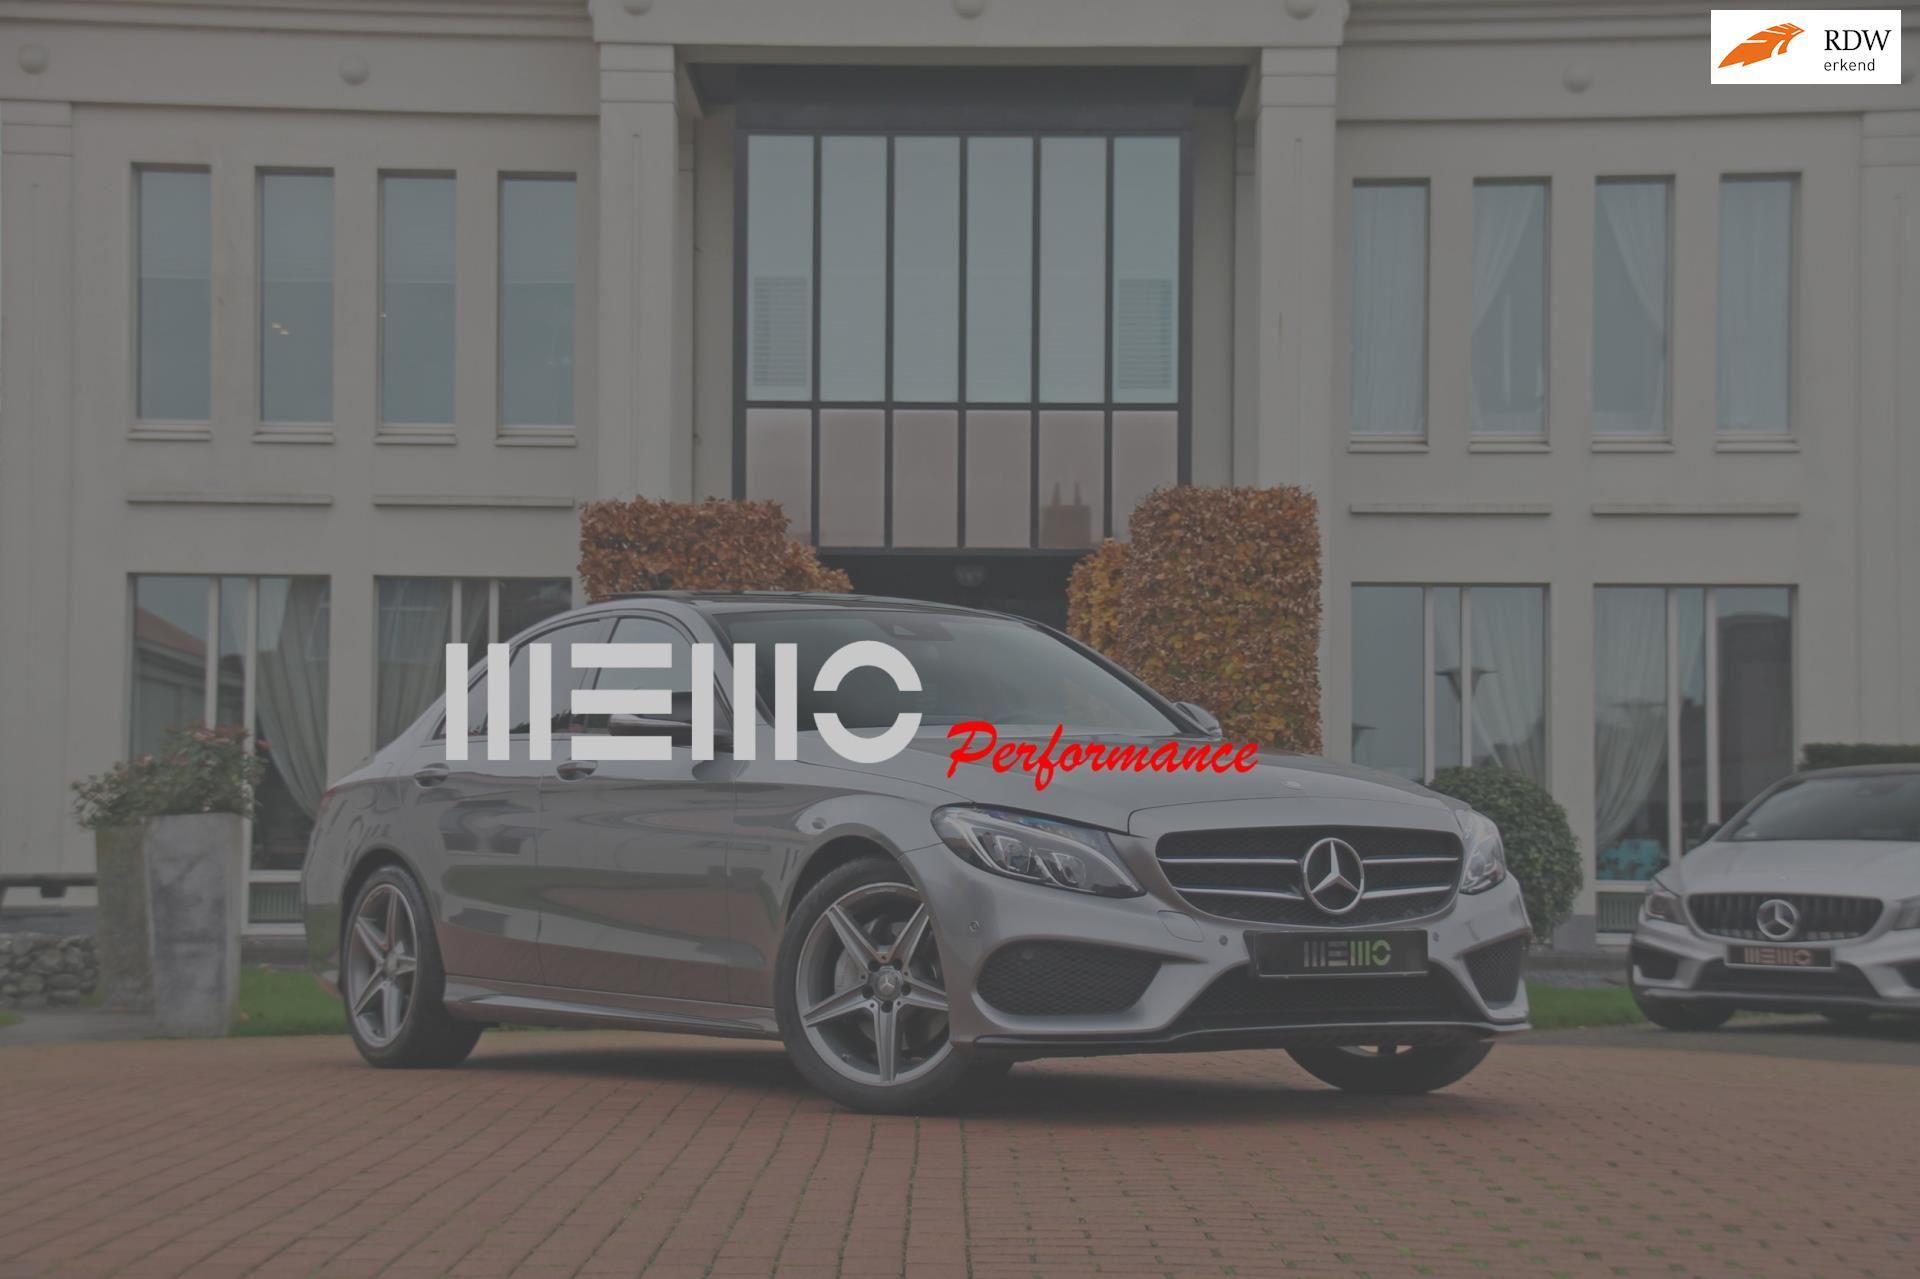 Mercedes-Benz C-klasse occasion - Memo Performance